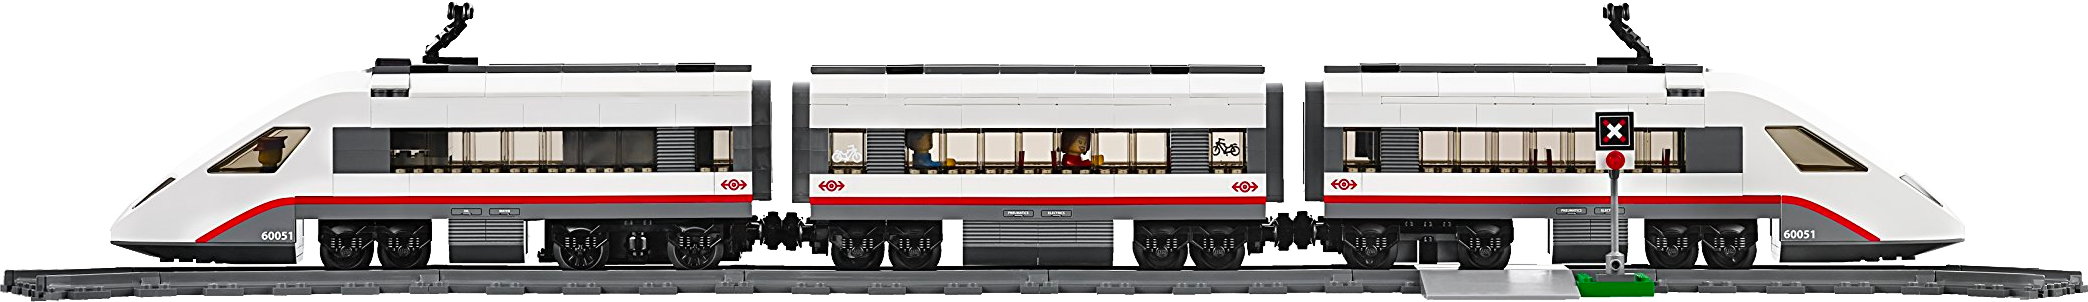 High-speed Passenger Train